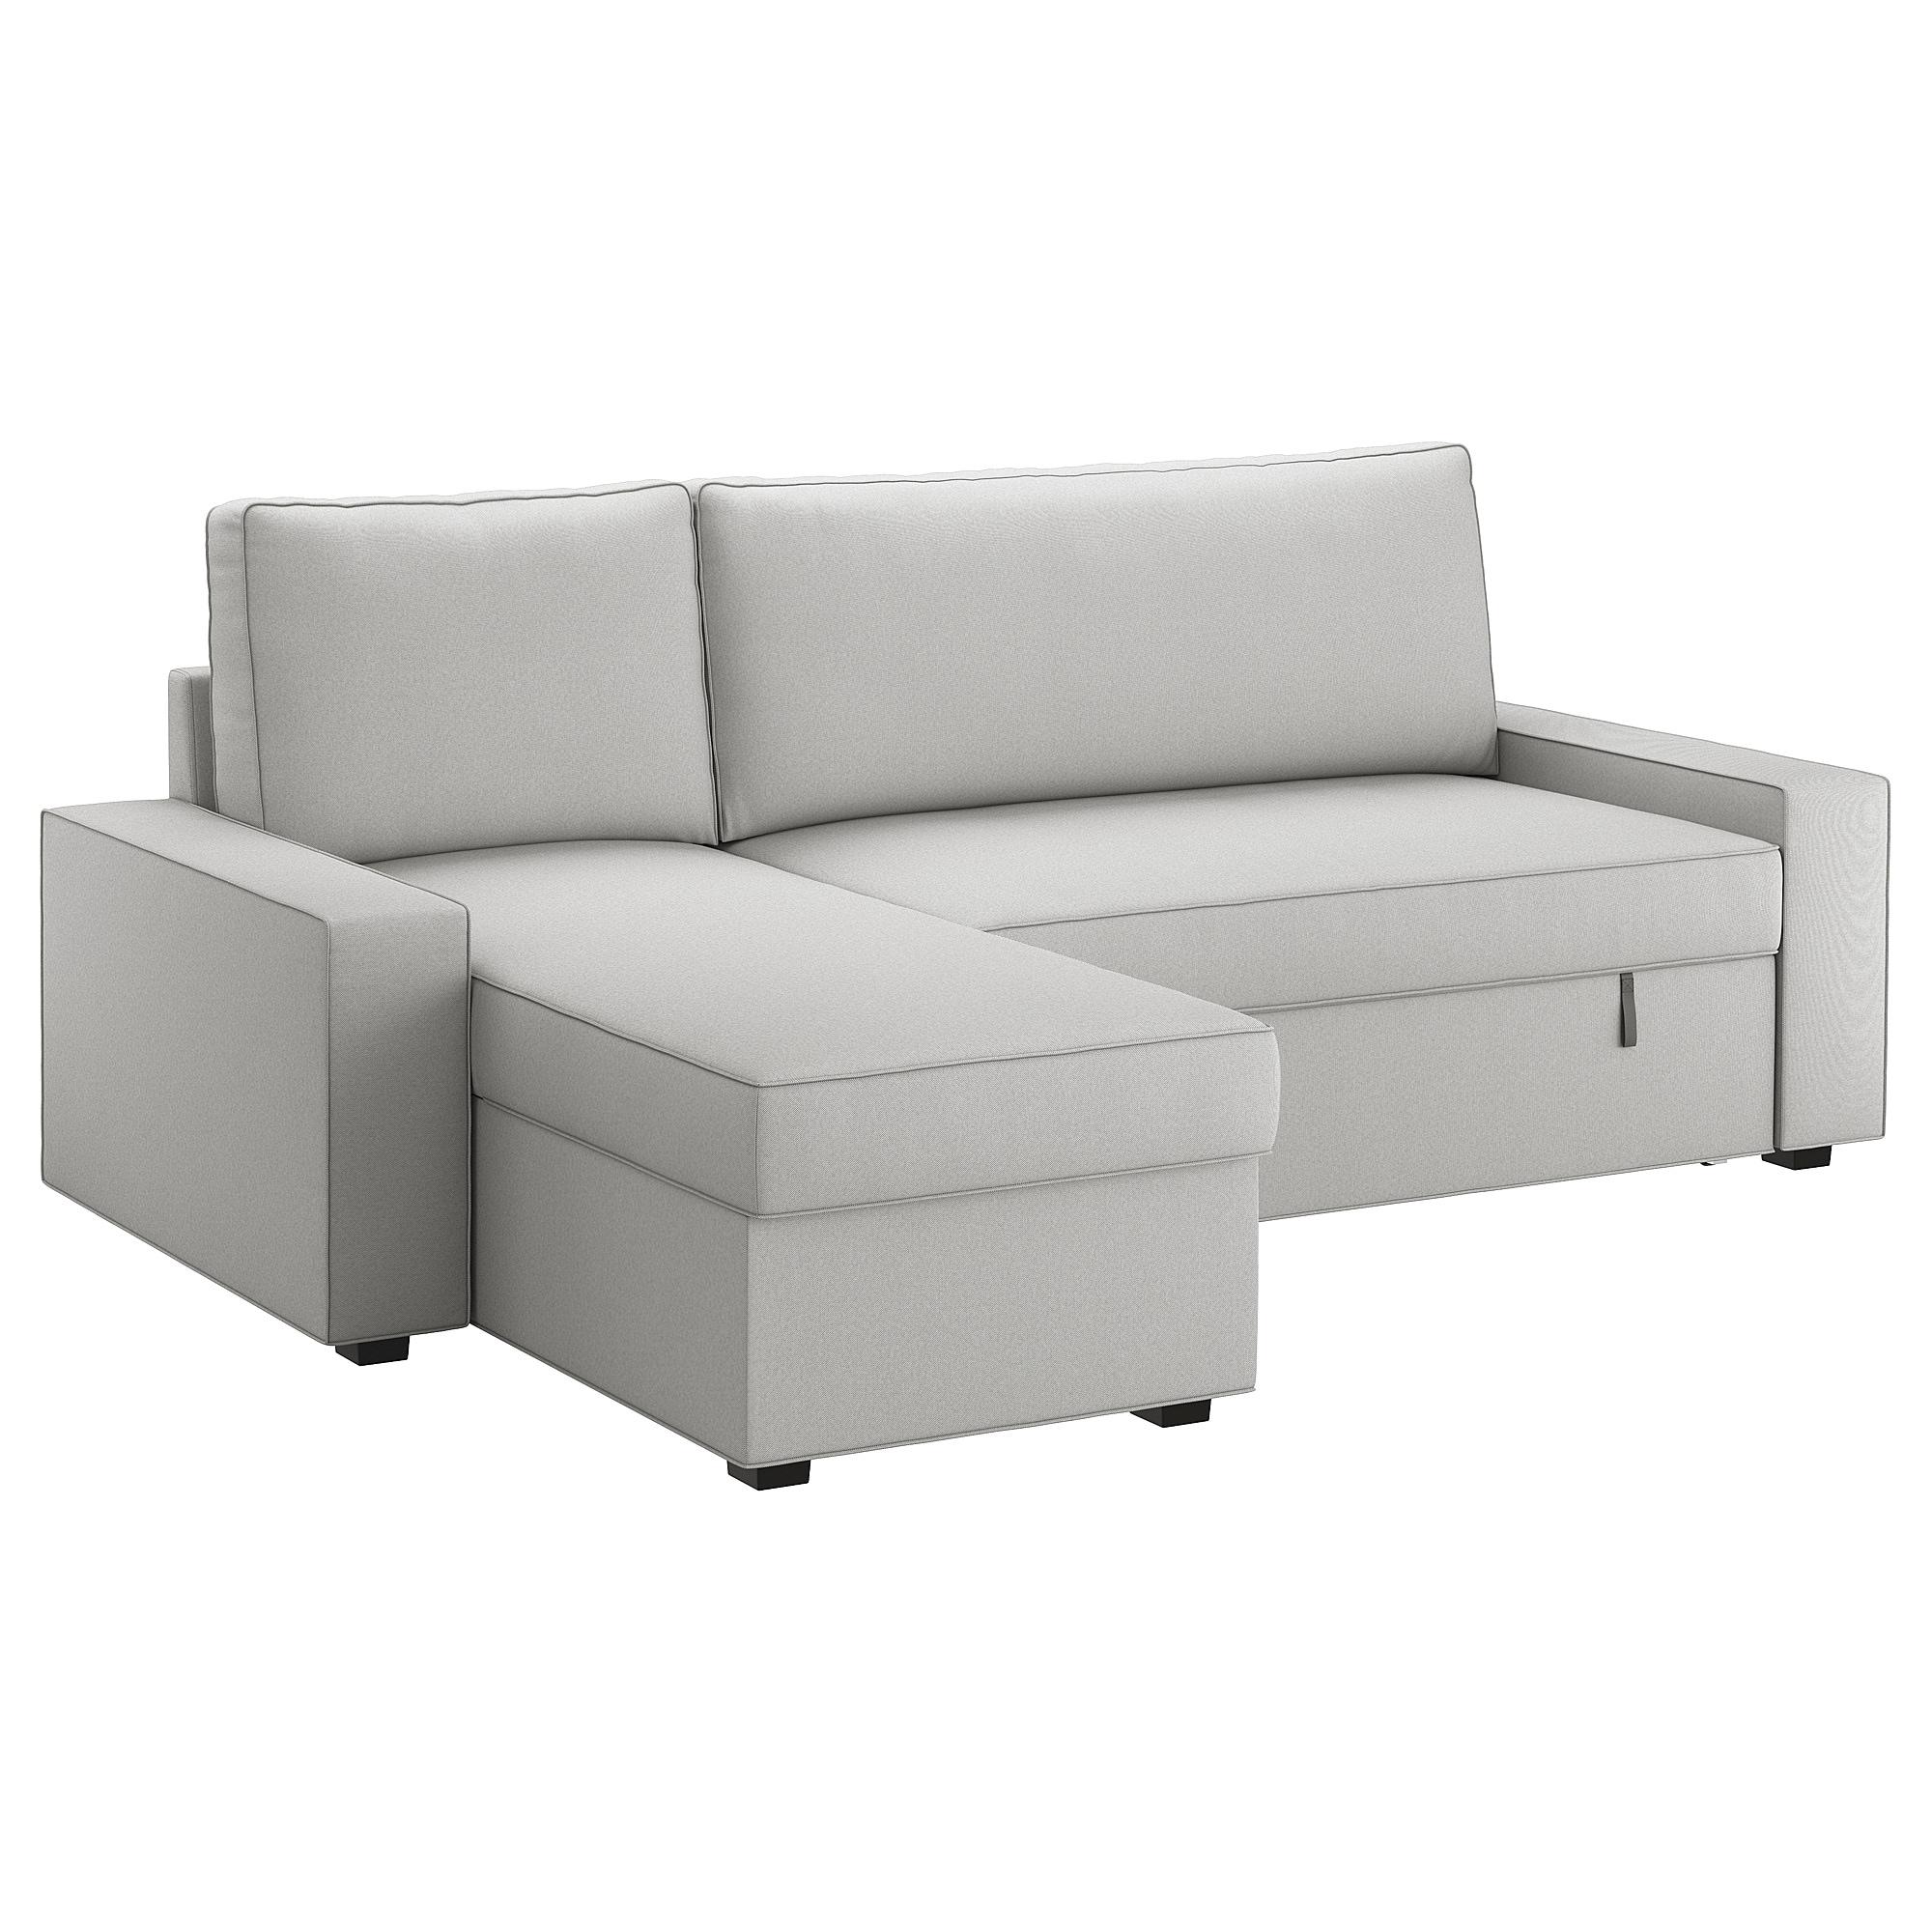 Funda sofa Cama 4pde Vilasund Funda sofà Cama Con Chaiselongue orrsta Gris Claro Ikea